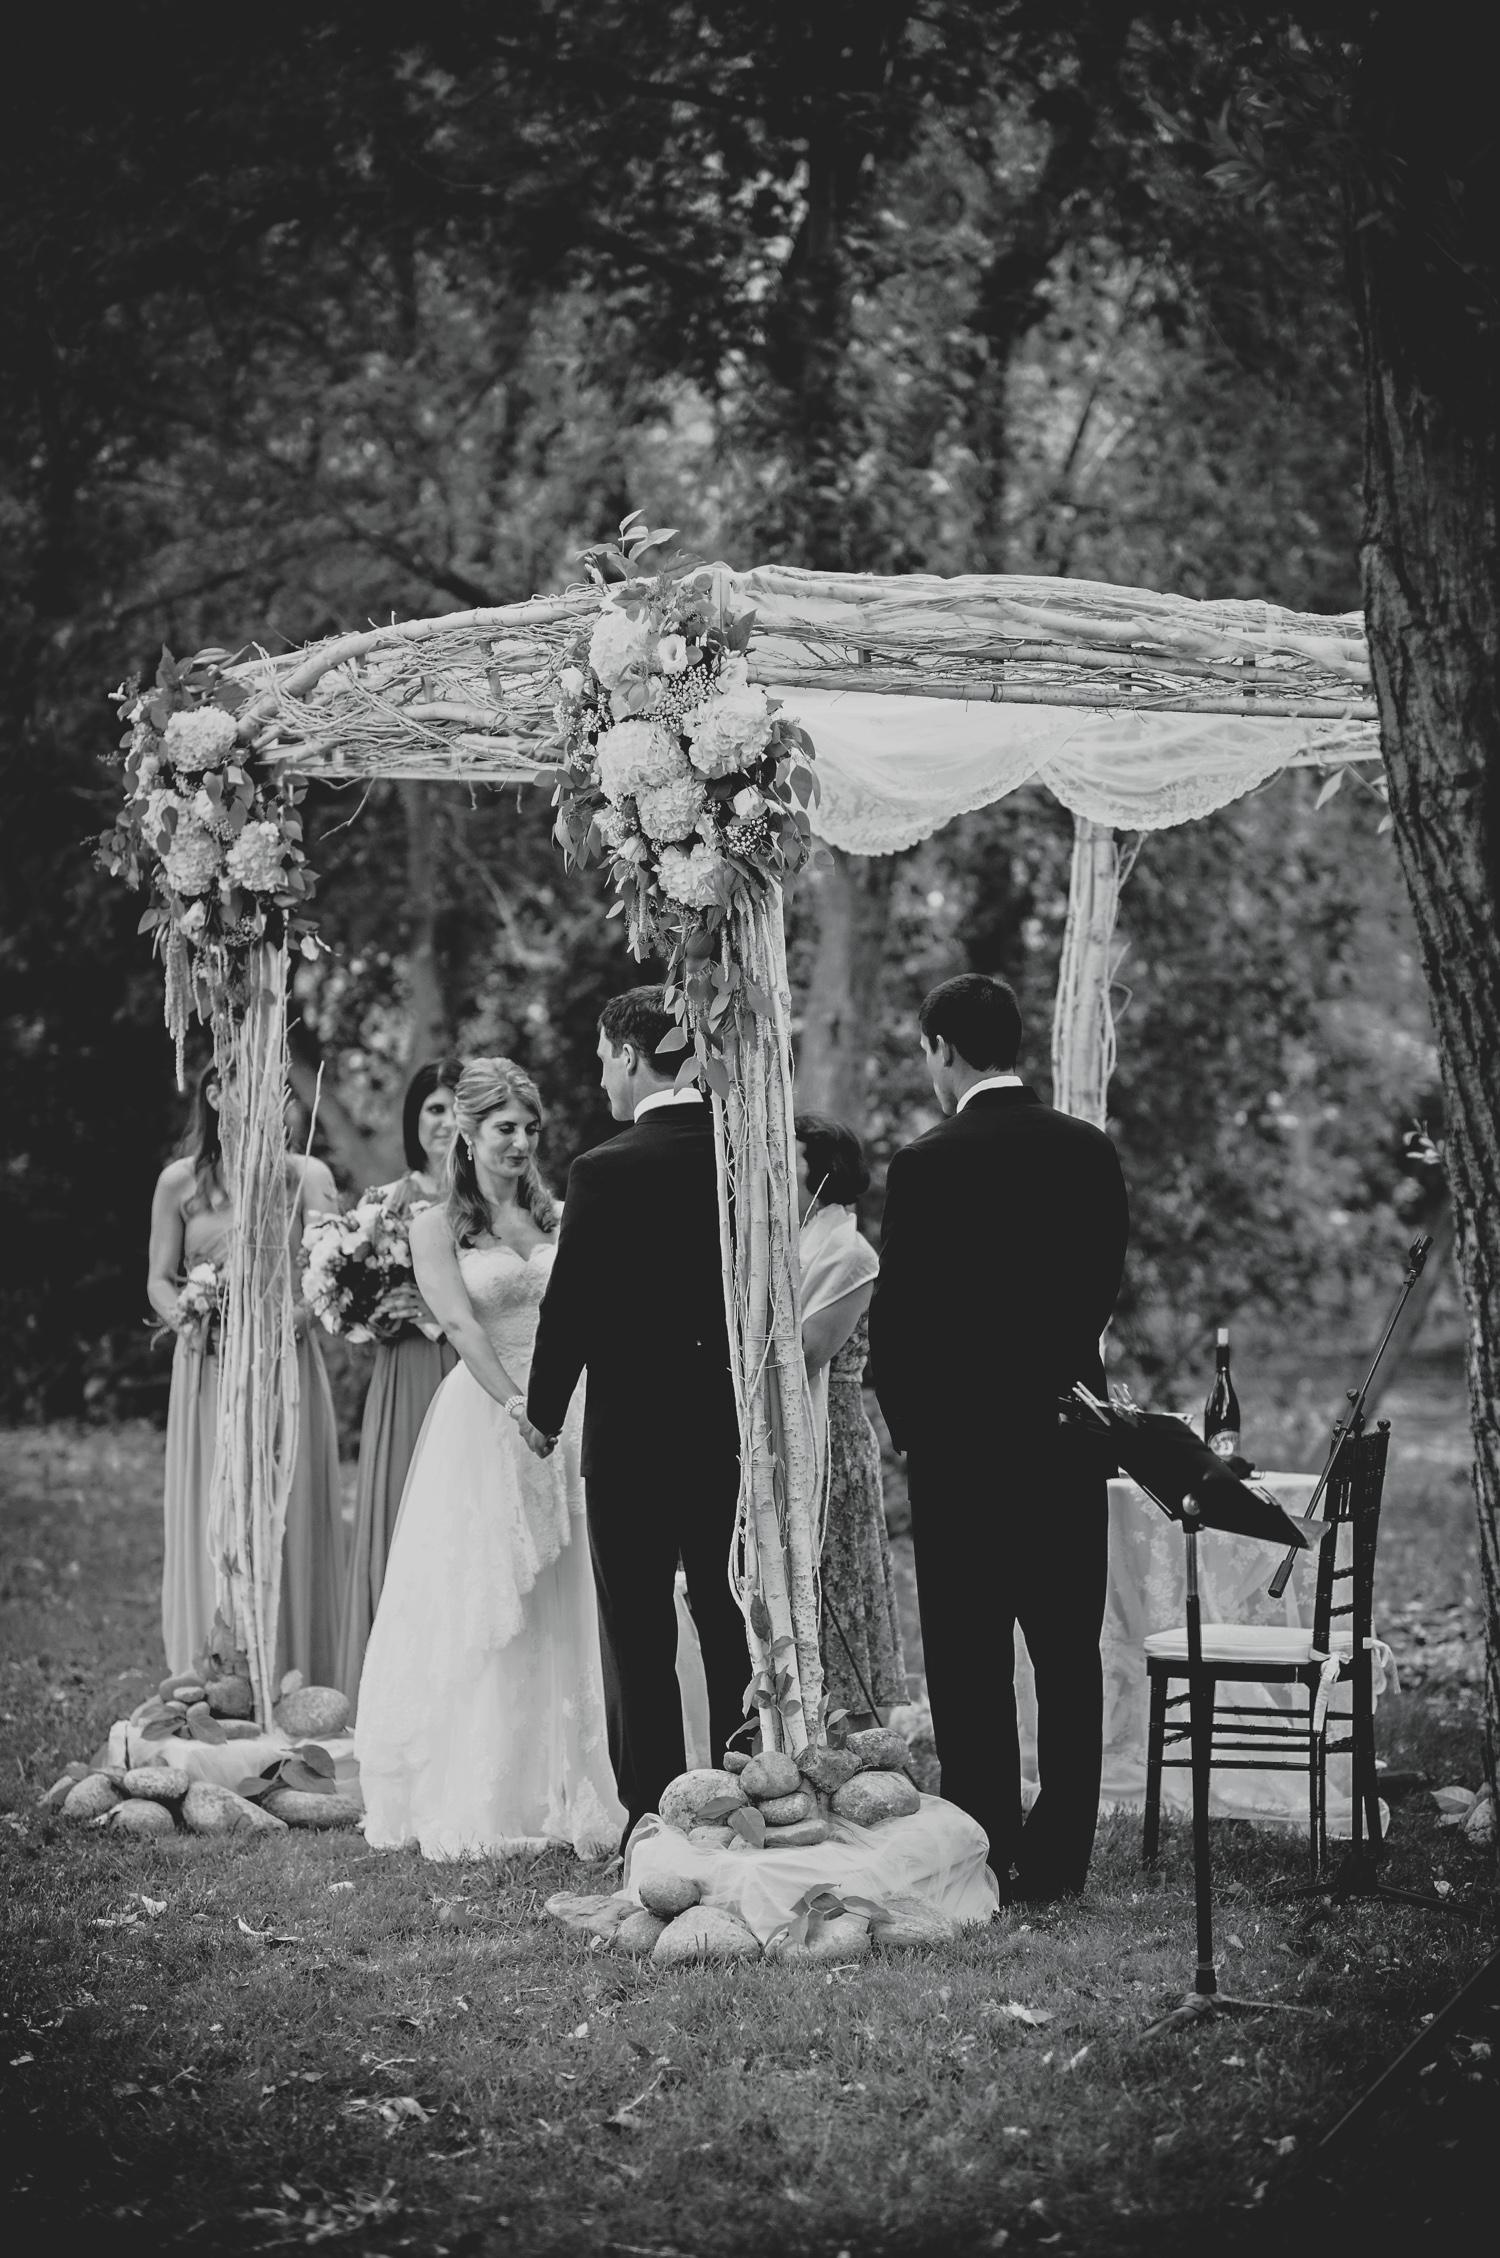 Planet_Bluegrass_Lyons_Wedding_053.JPG